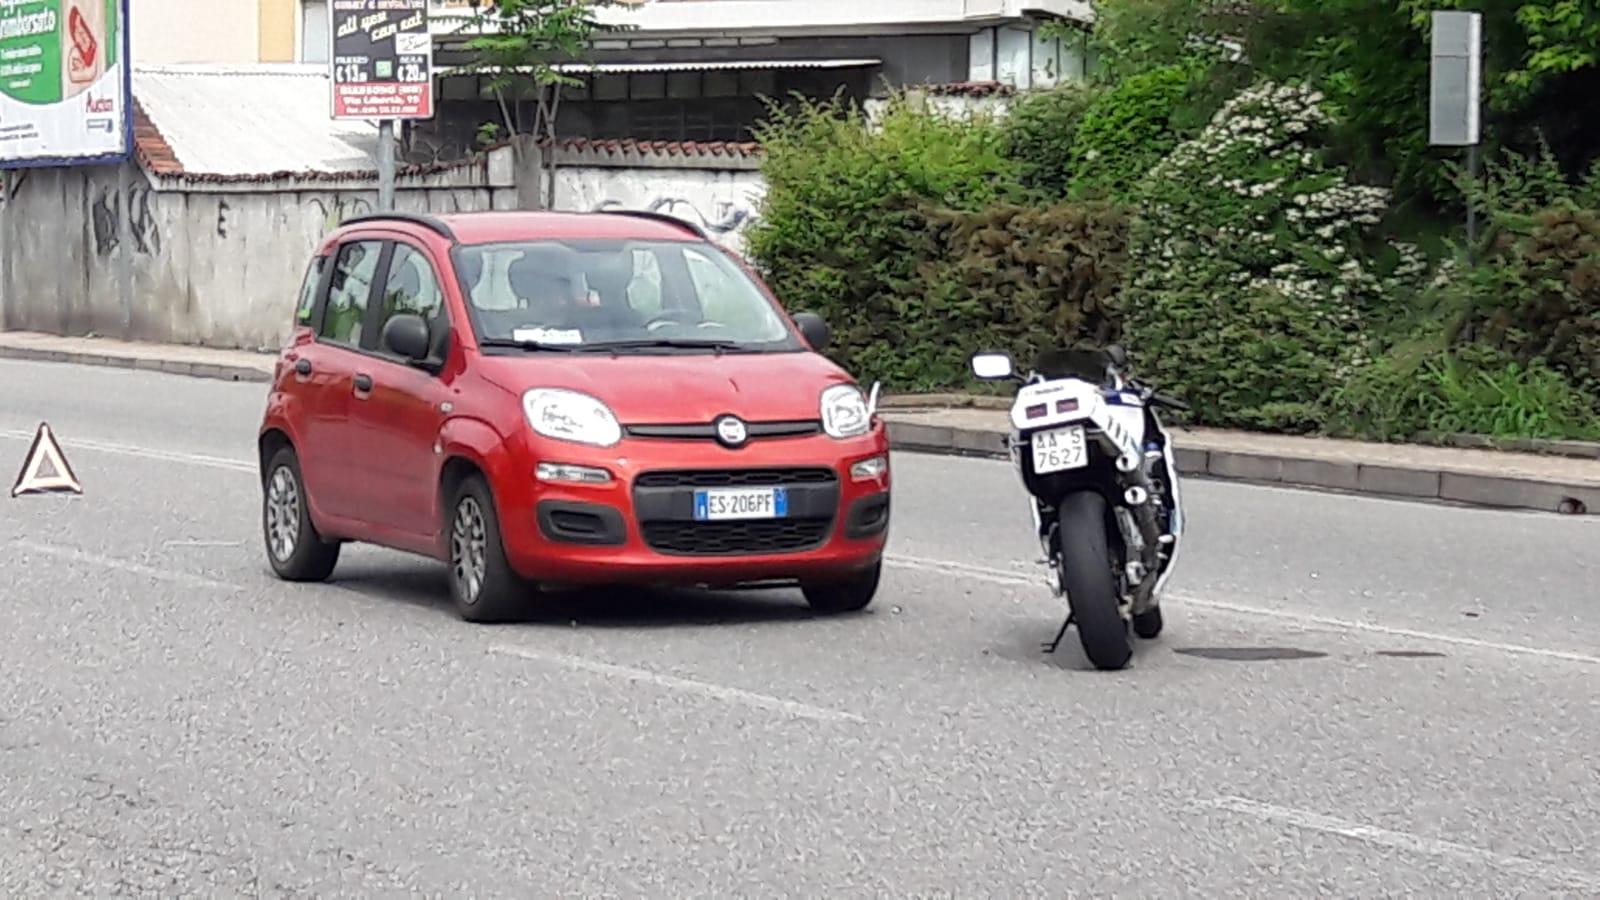 Incidente sulla Monza - Saronno, motociclista trasportato al San Gerardo